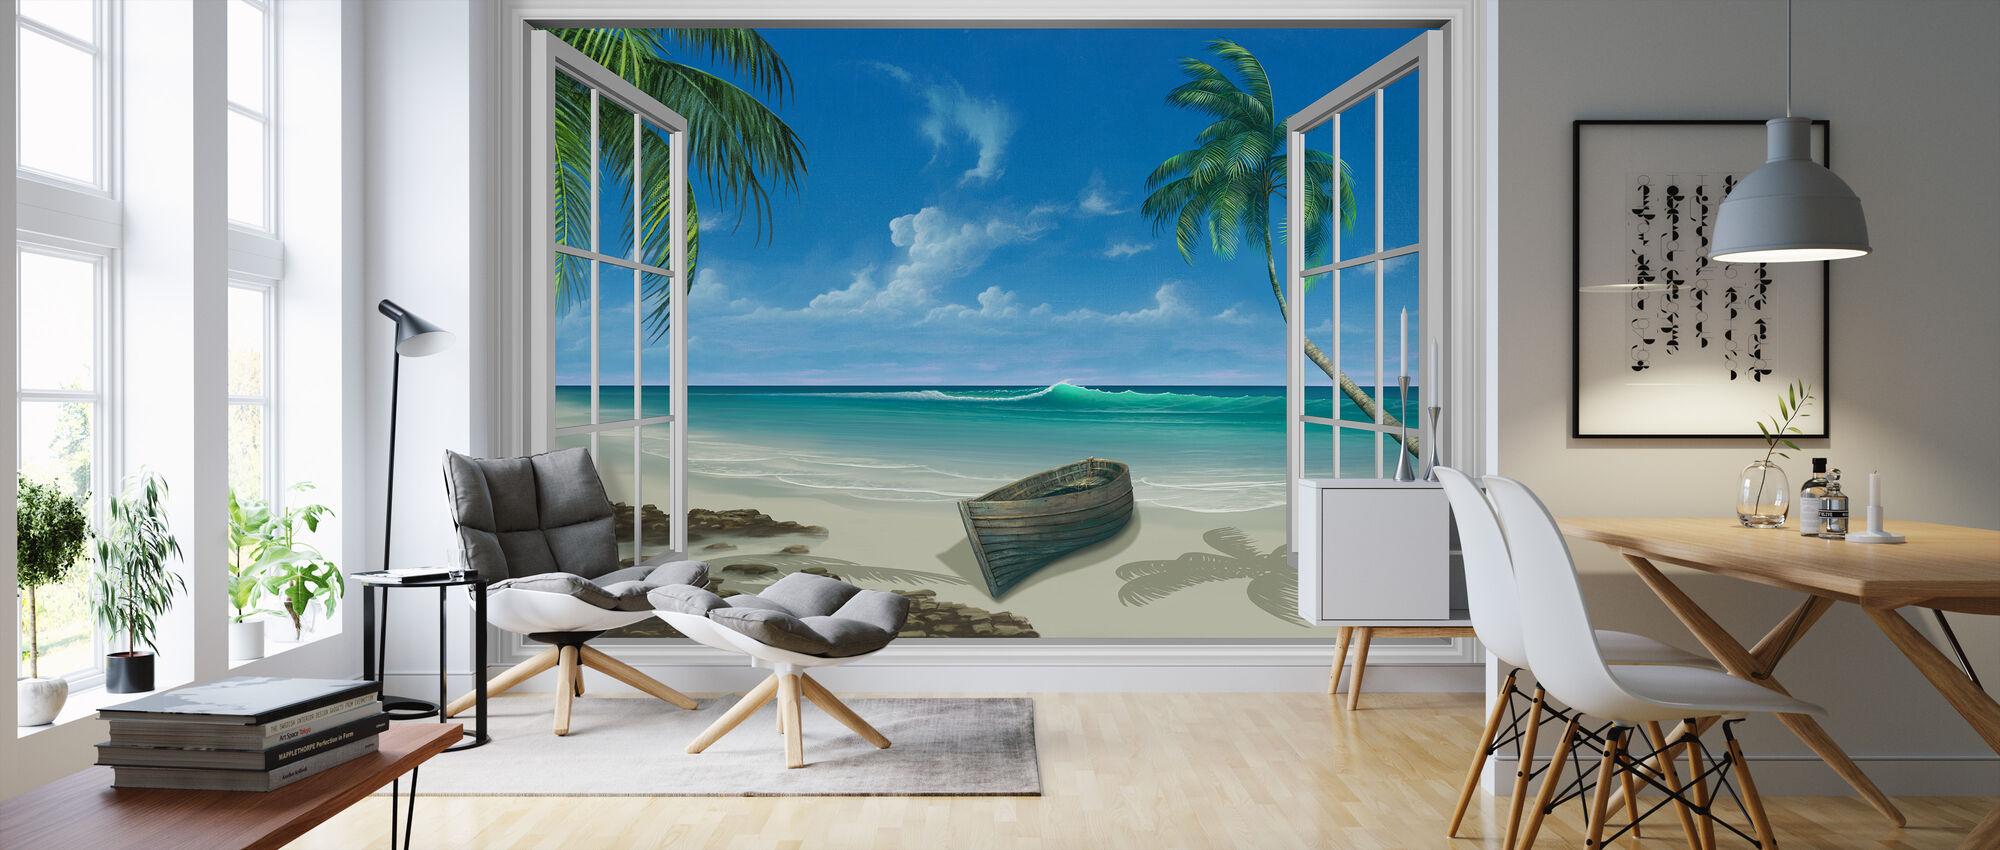 Paeta paratiisiin - Tapetti - Olohuone